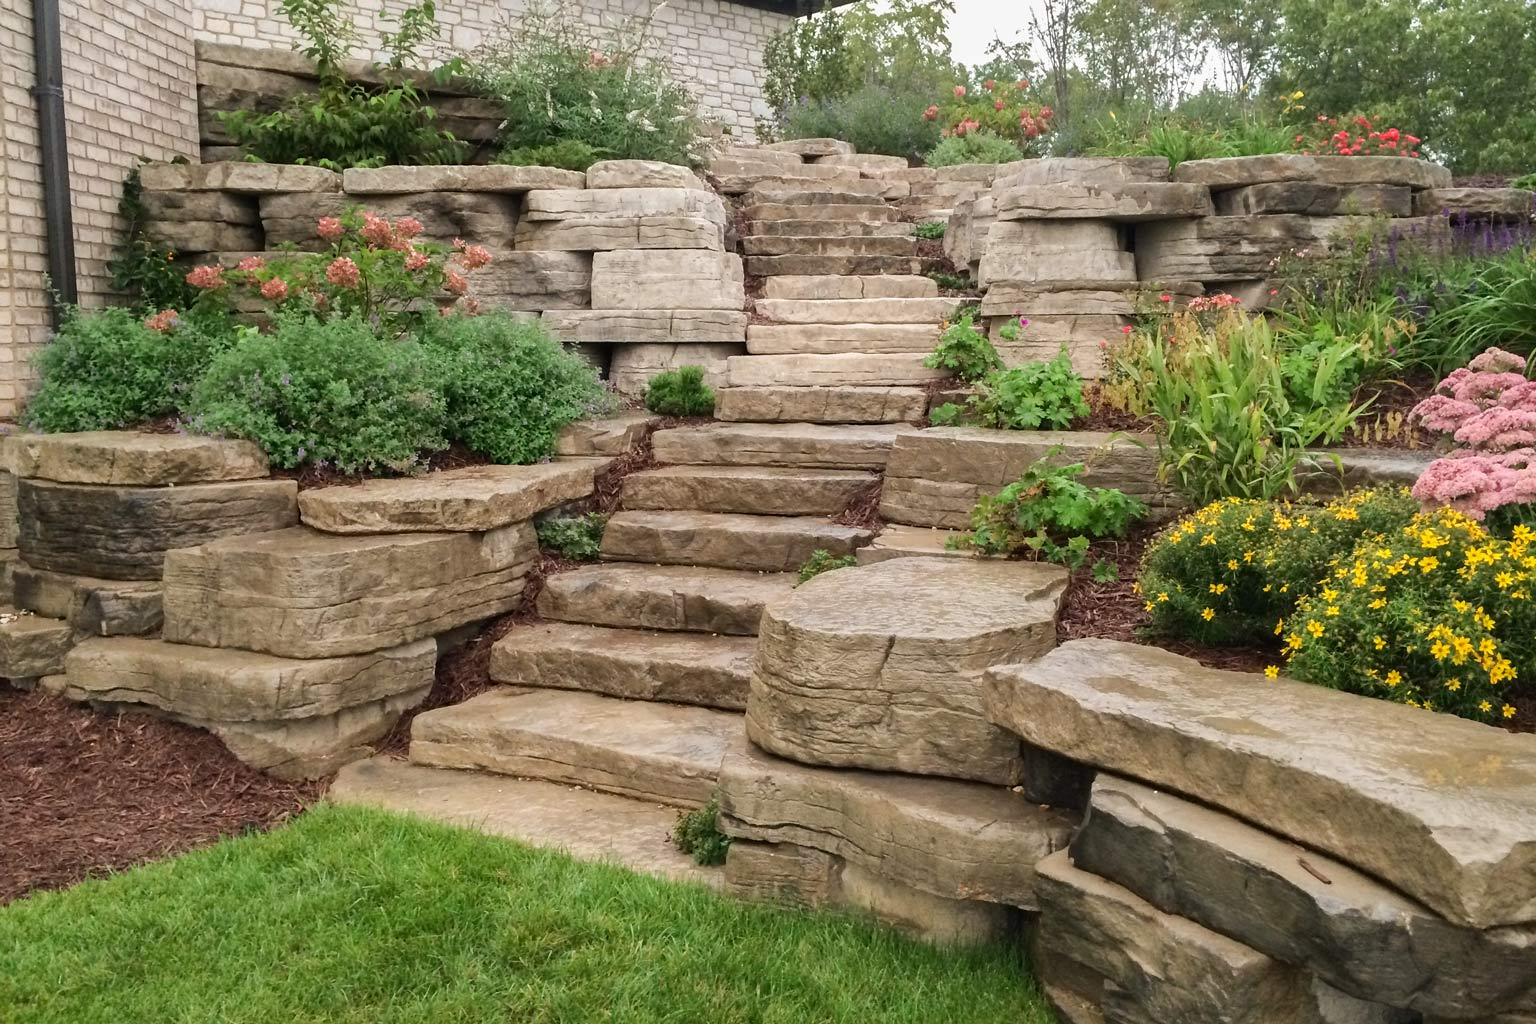 Rosetta Irregular Steps Have Stone Like Shapes For